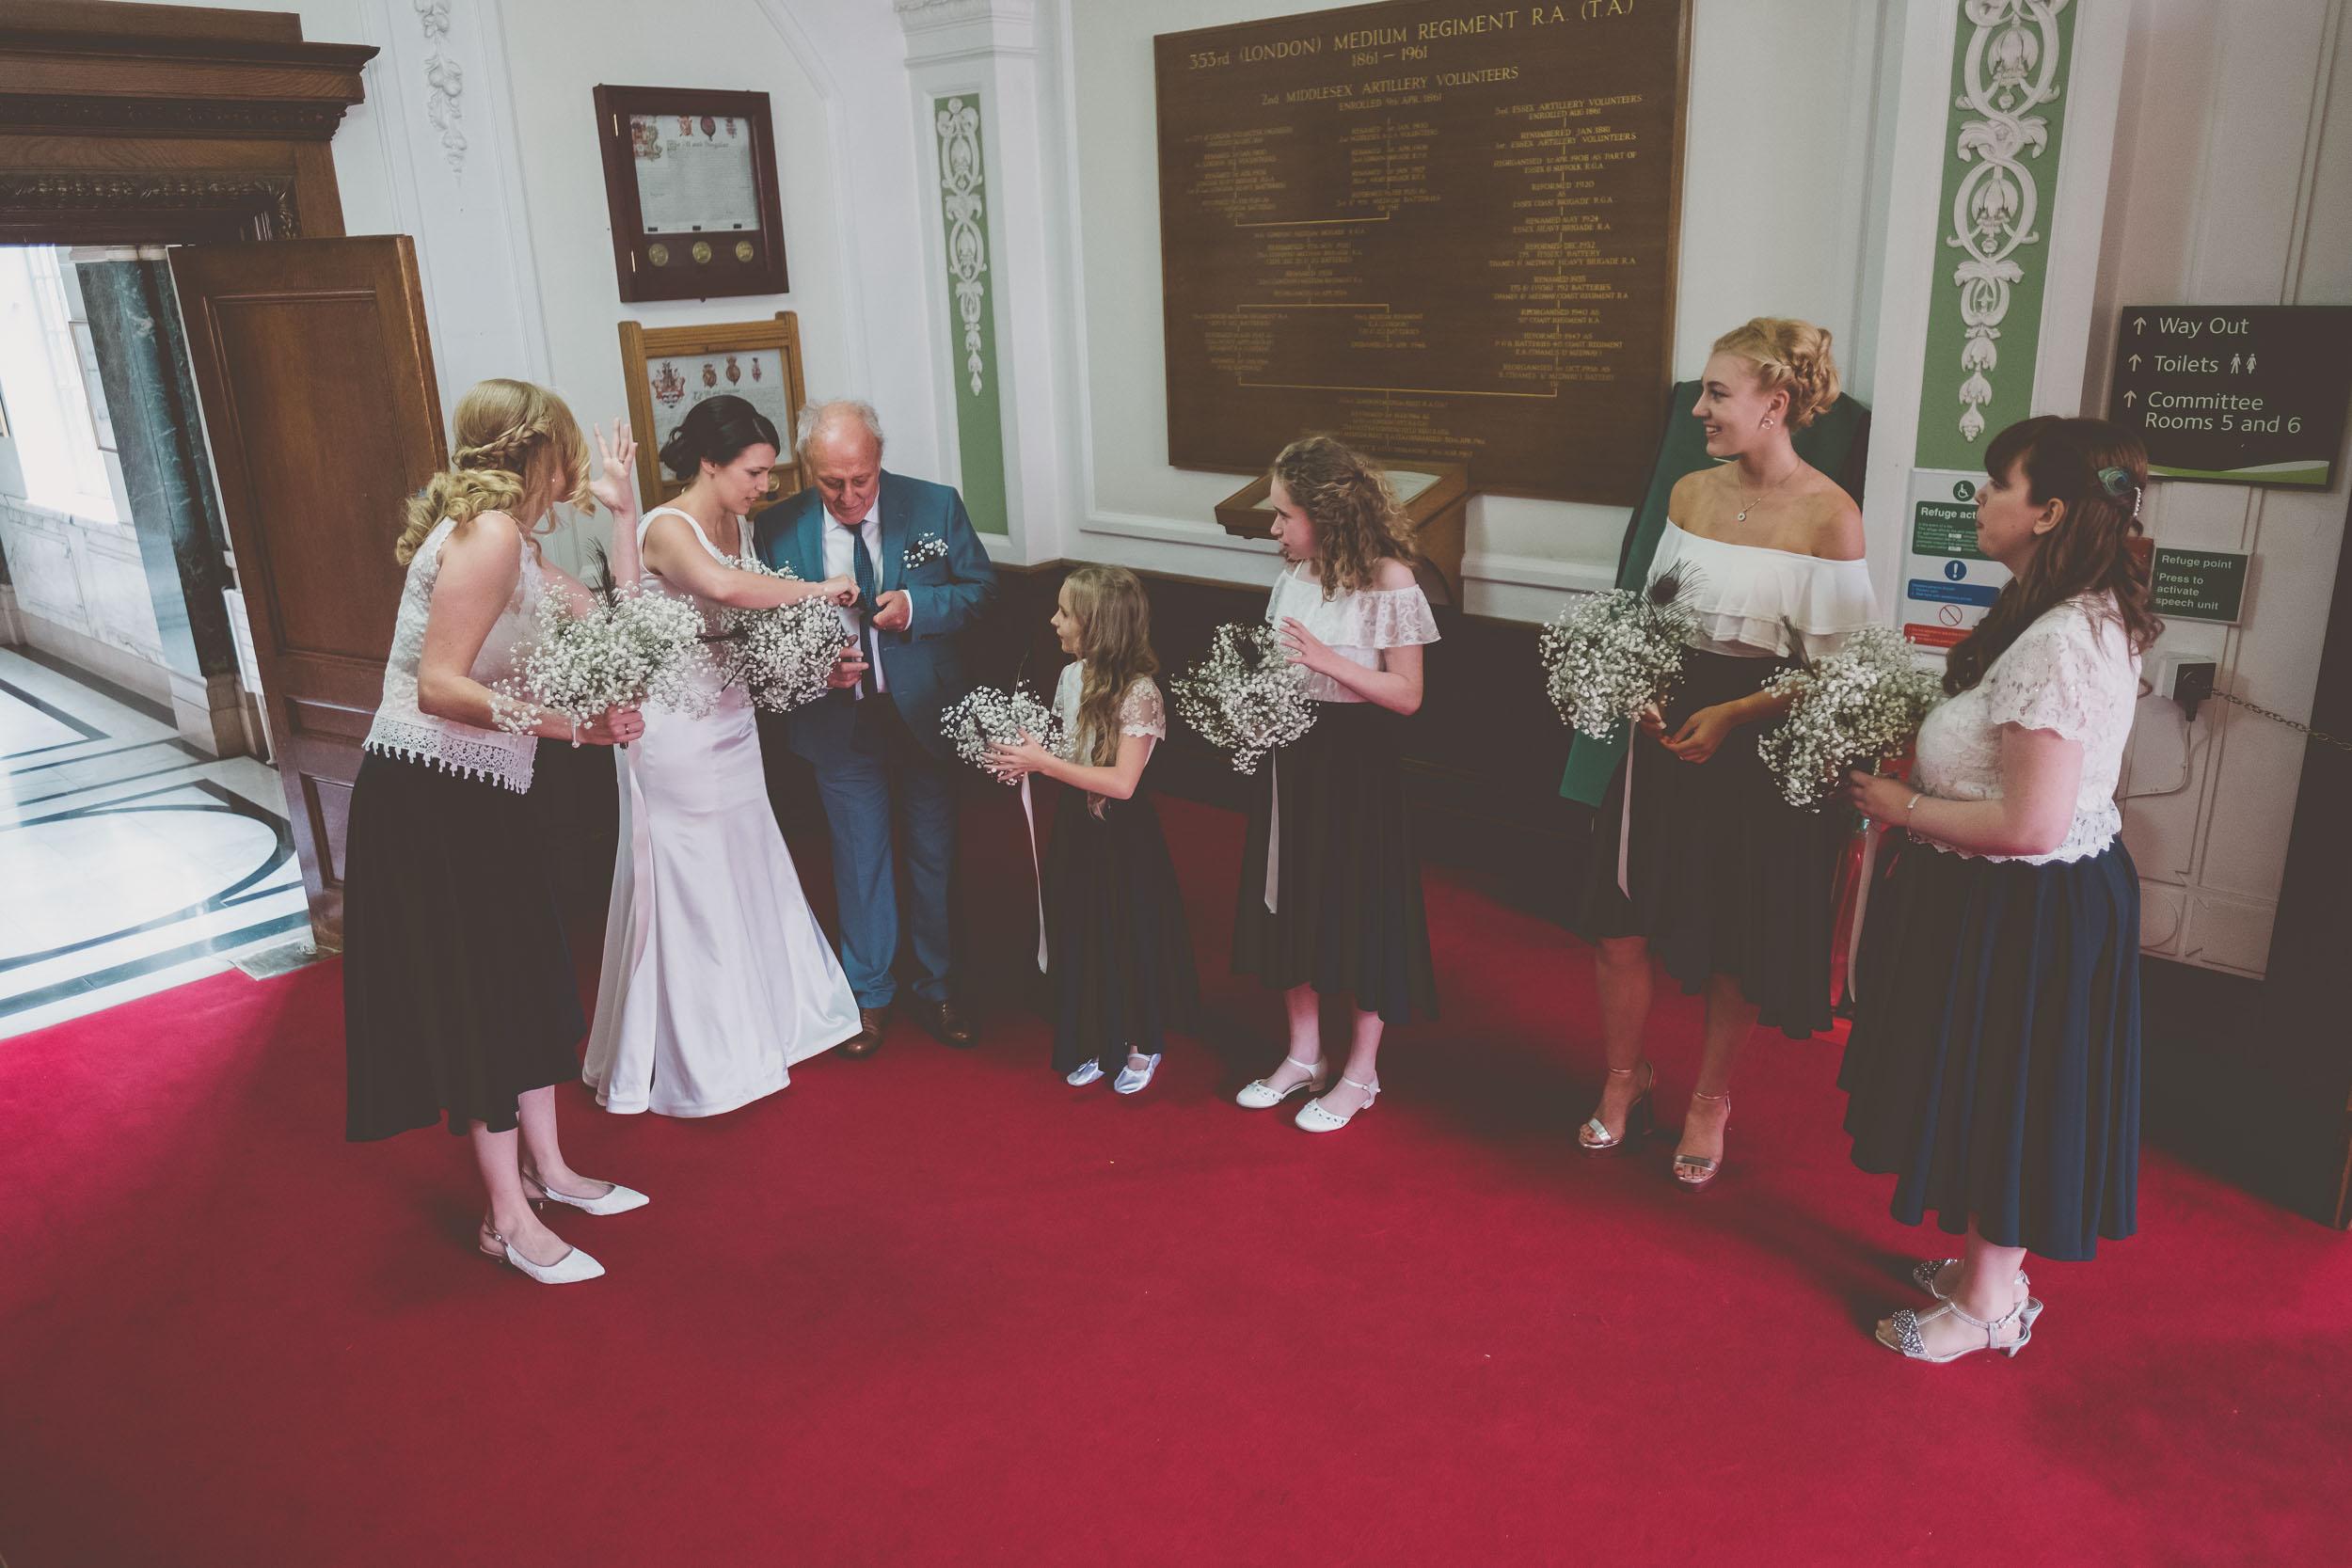 islington-town-hall-4th-floor-studios-wedding039.jpg